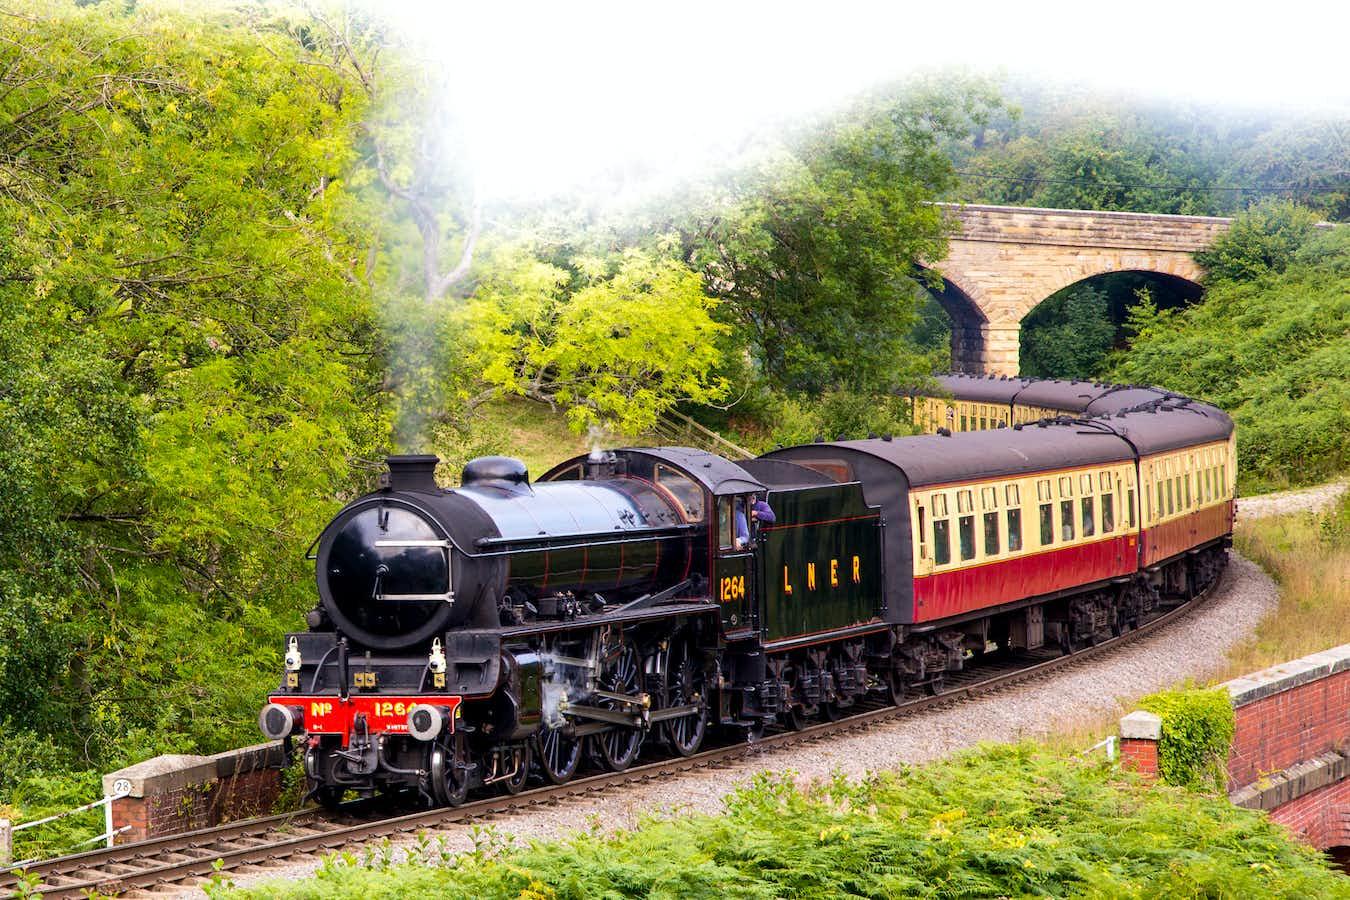 Yorkshire Coast Highlights and North York Moors Railway